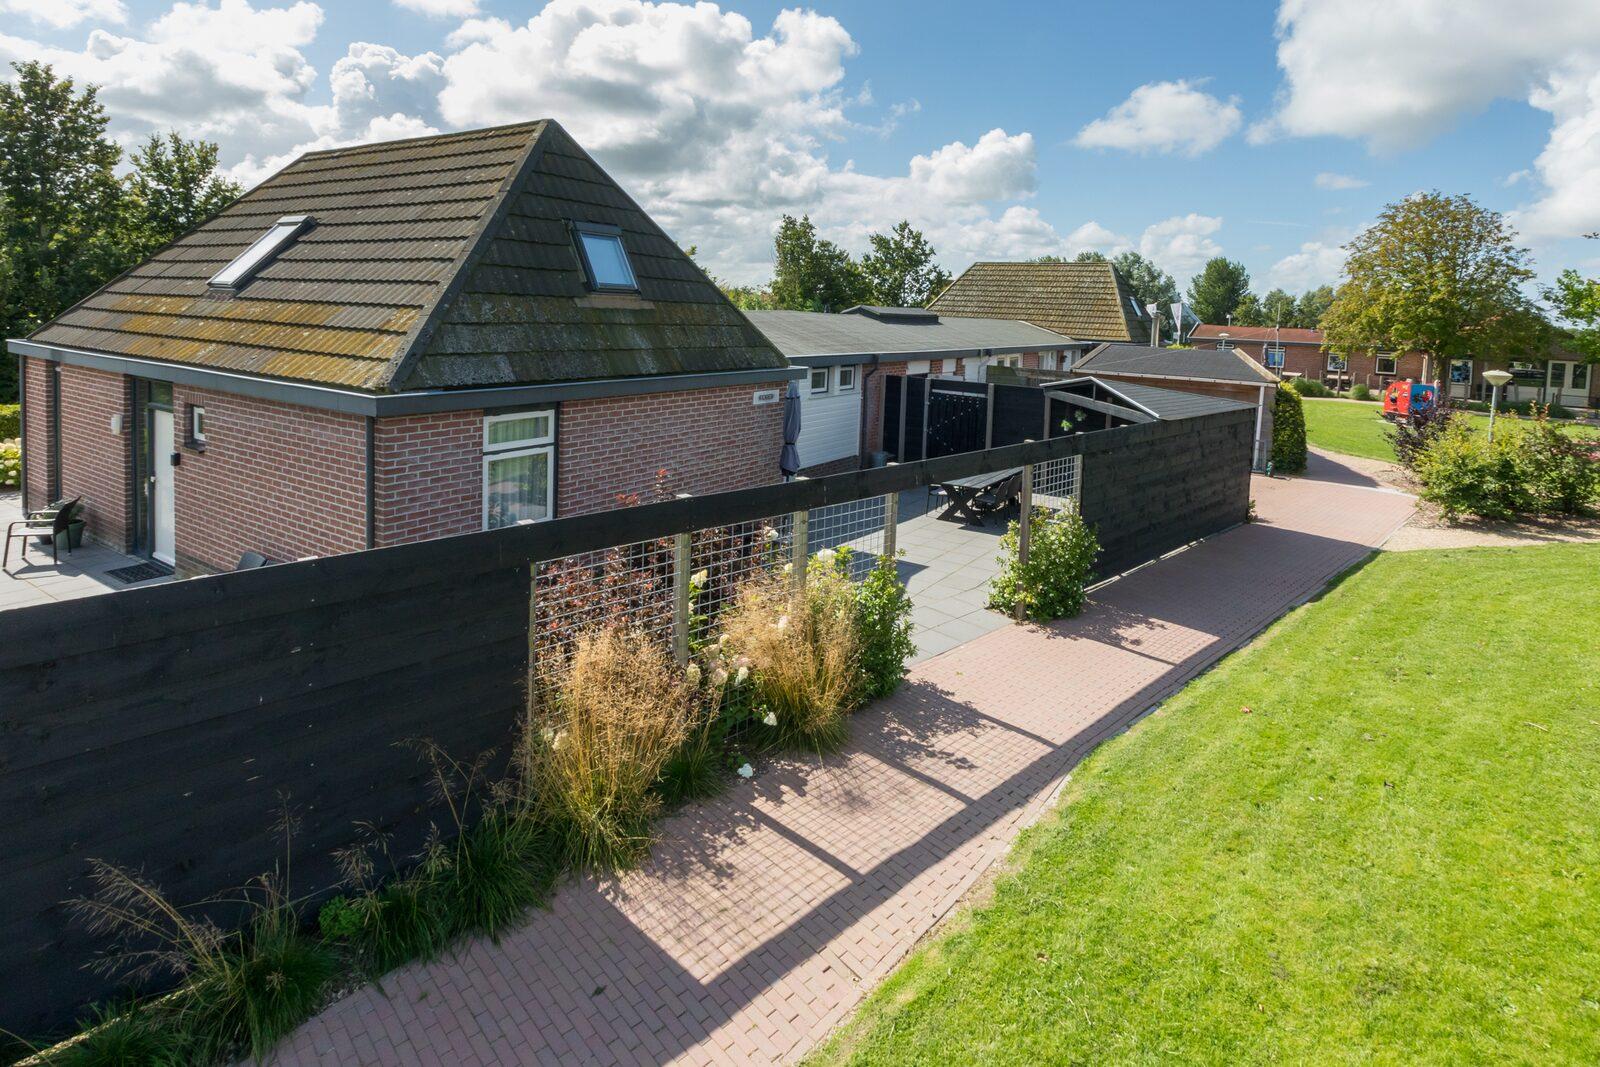 Ferienhaus - Oostkapelseweg 32 | Serooskerke 'Reiger'